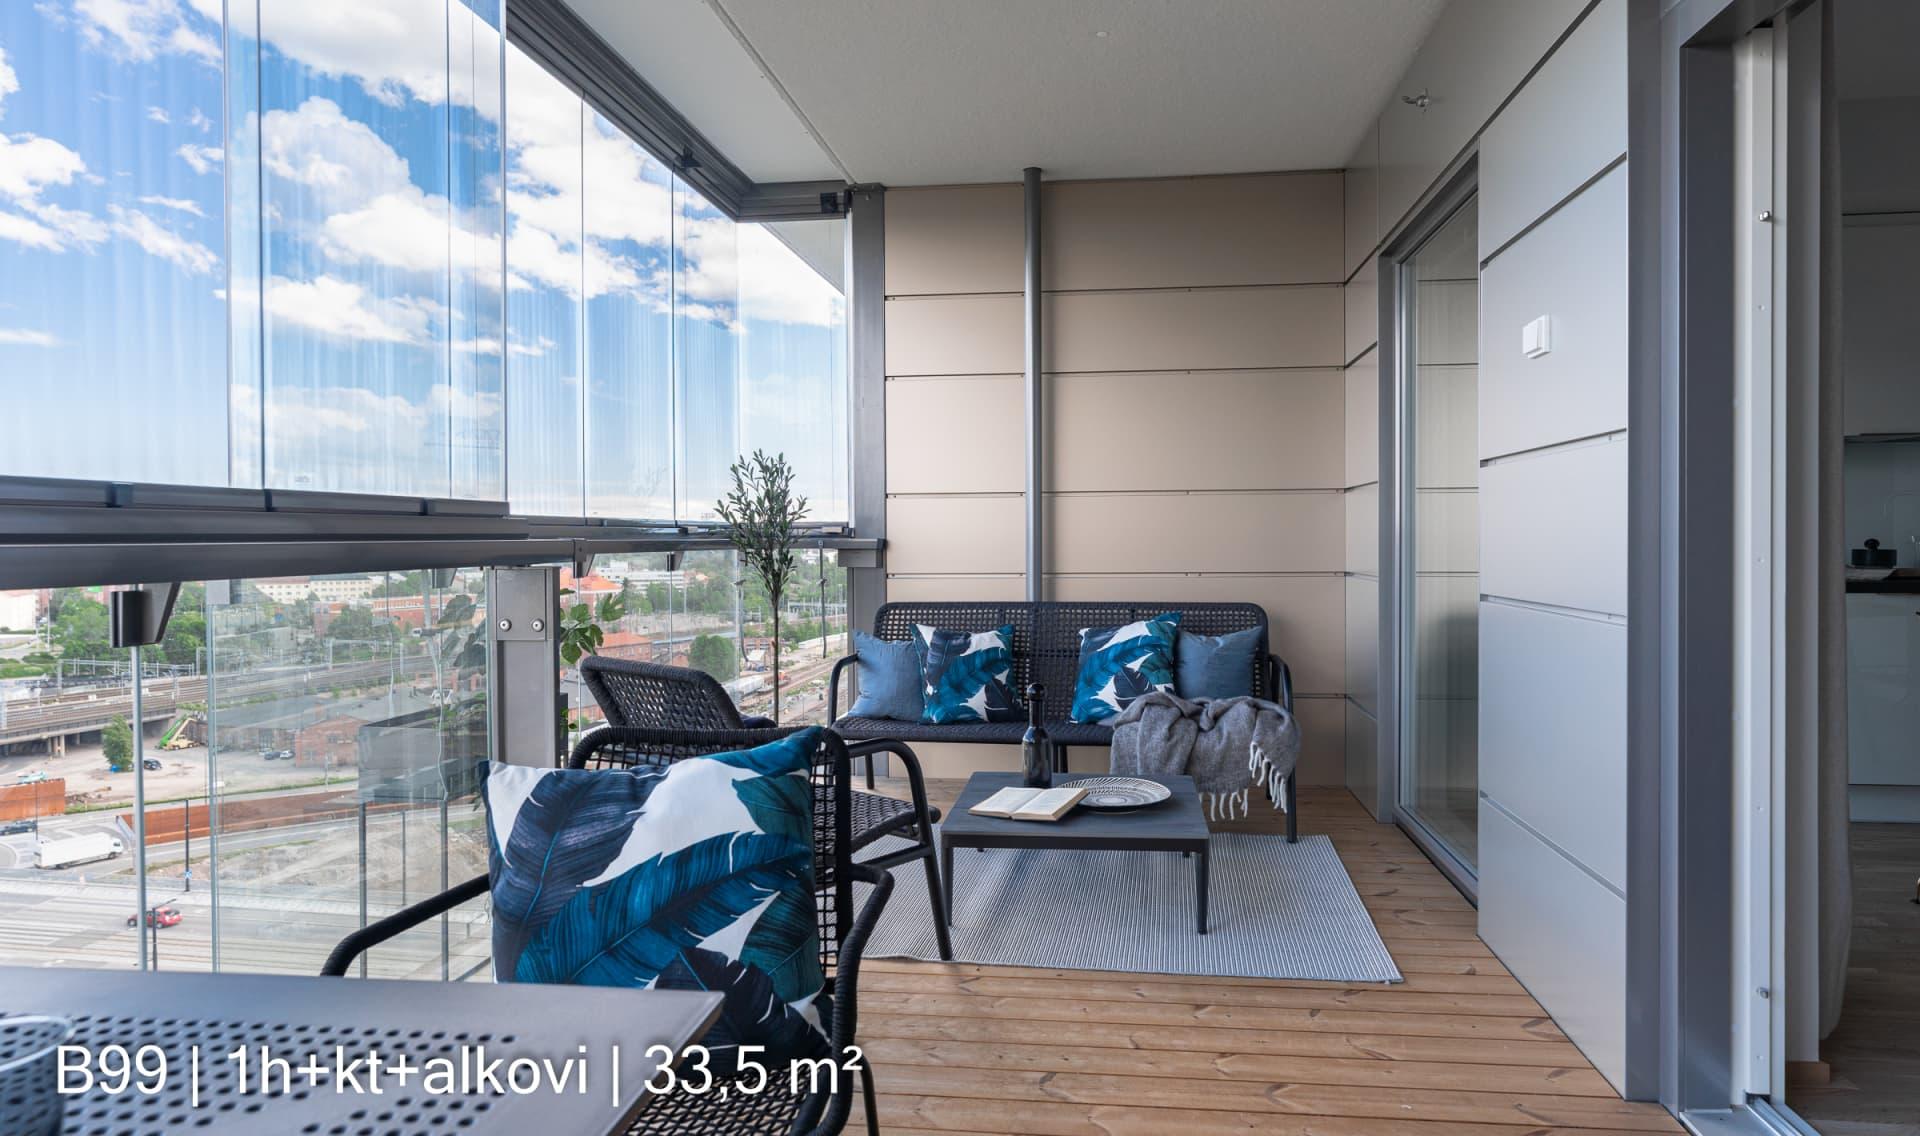 Myytävät asunnot Helsinki, Tripla, Pasila - Asunto Oy Helsingin Klyyga